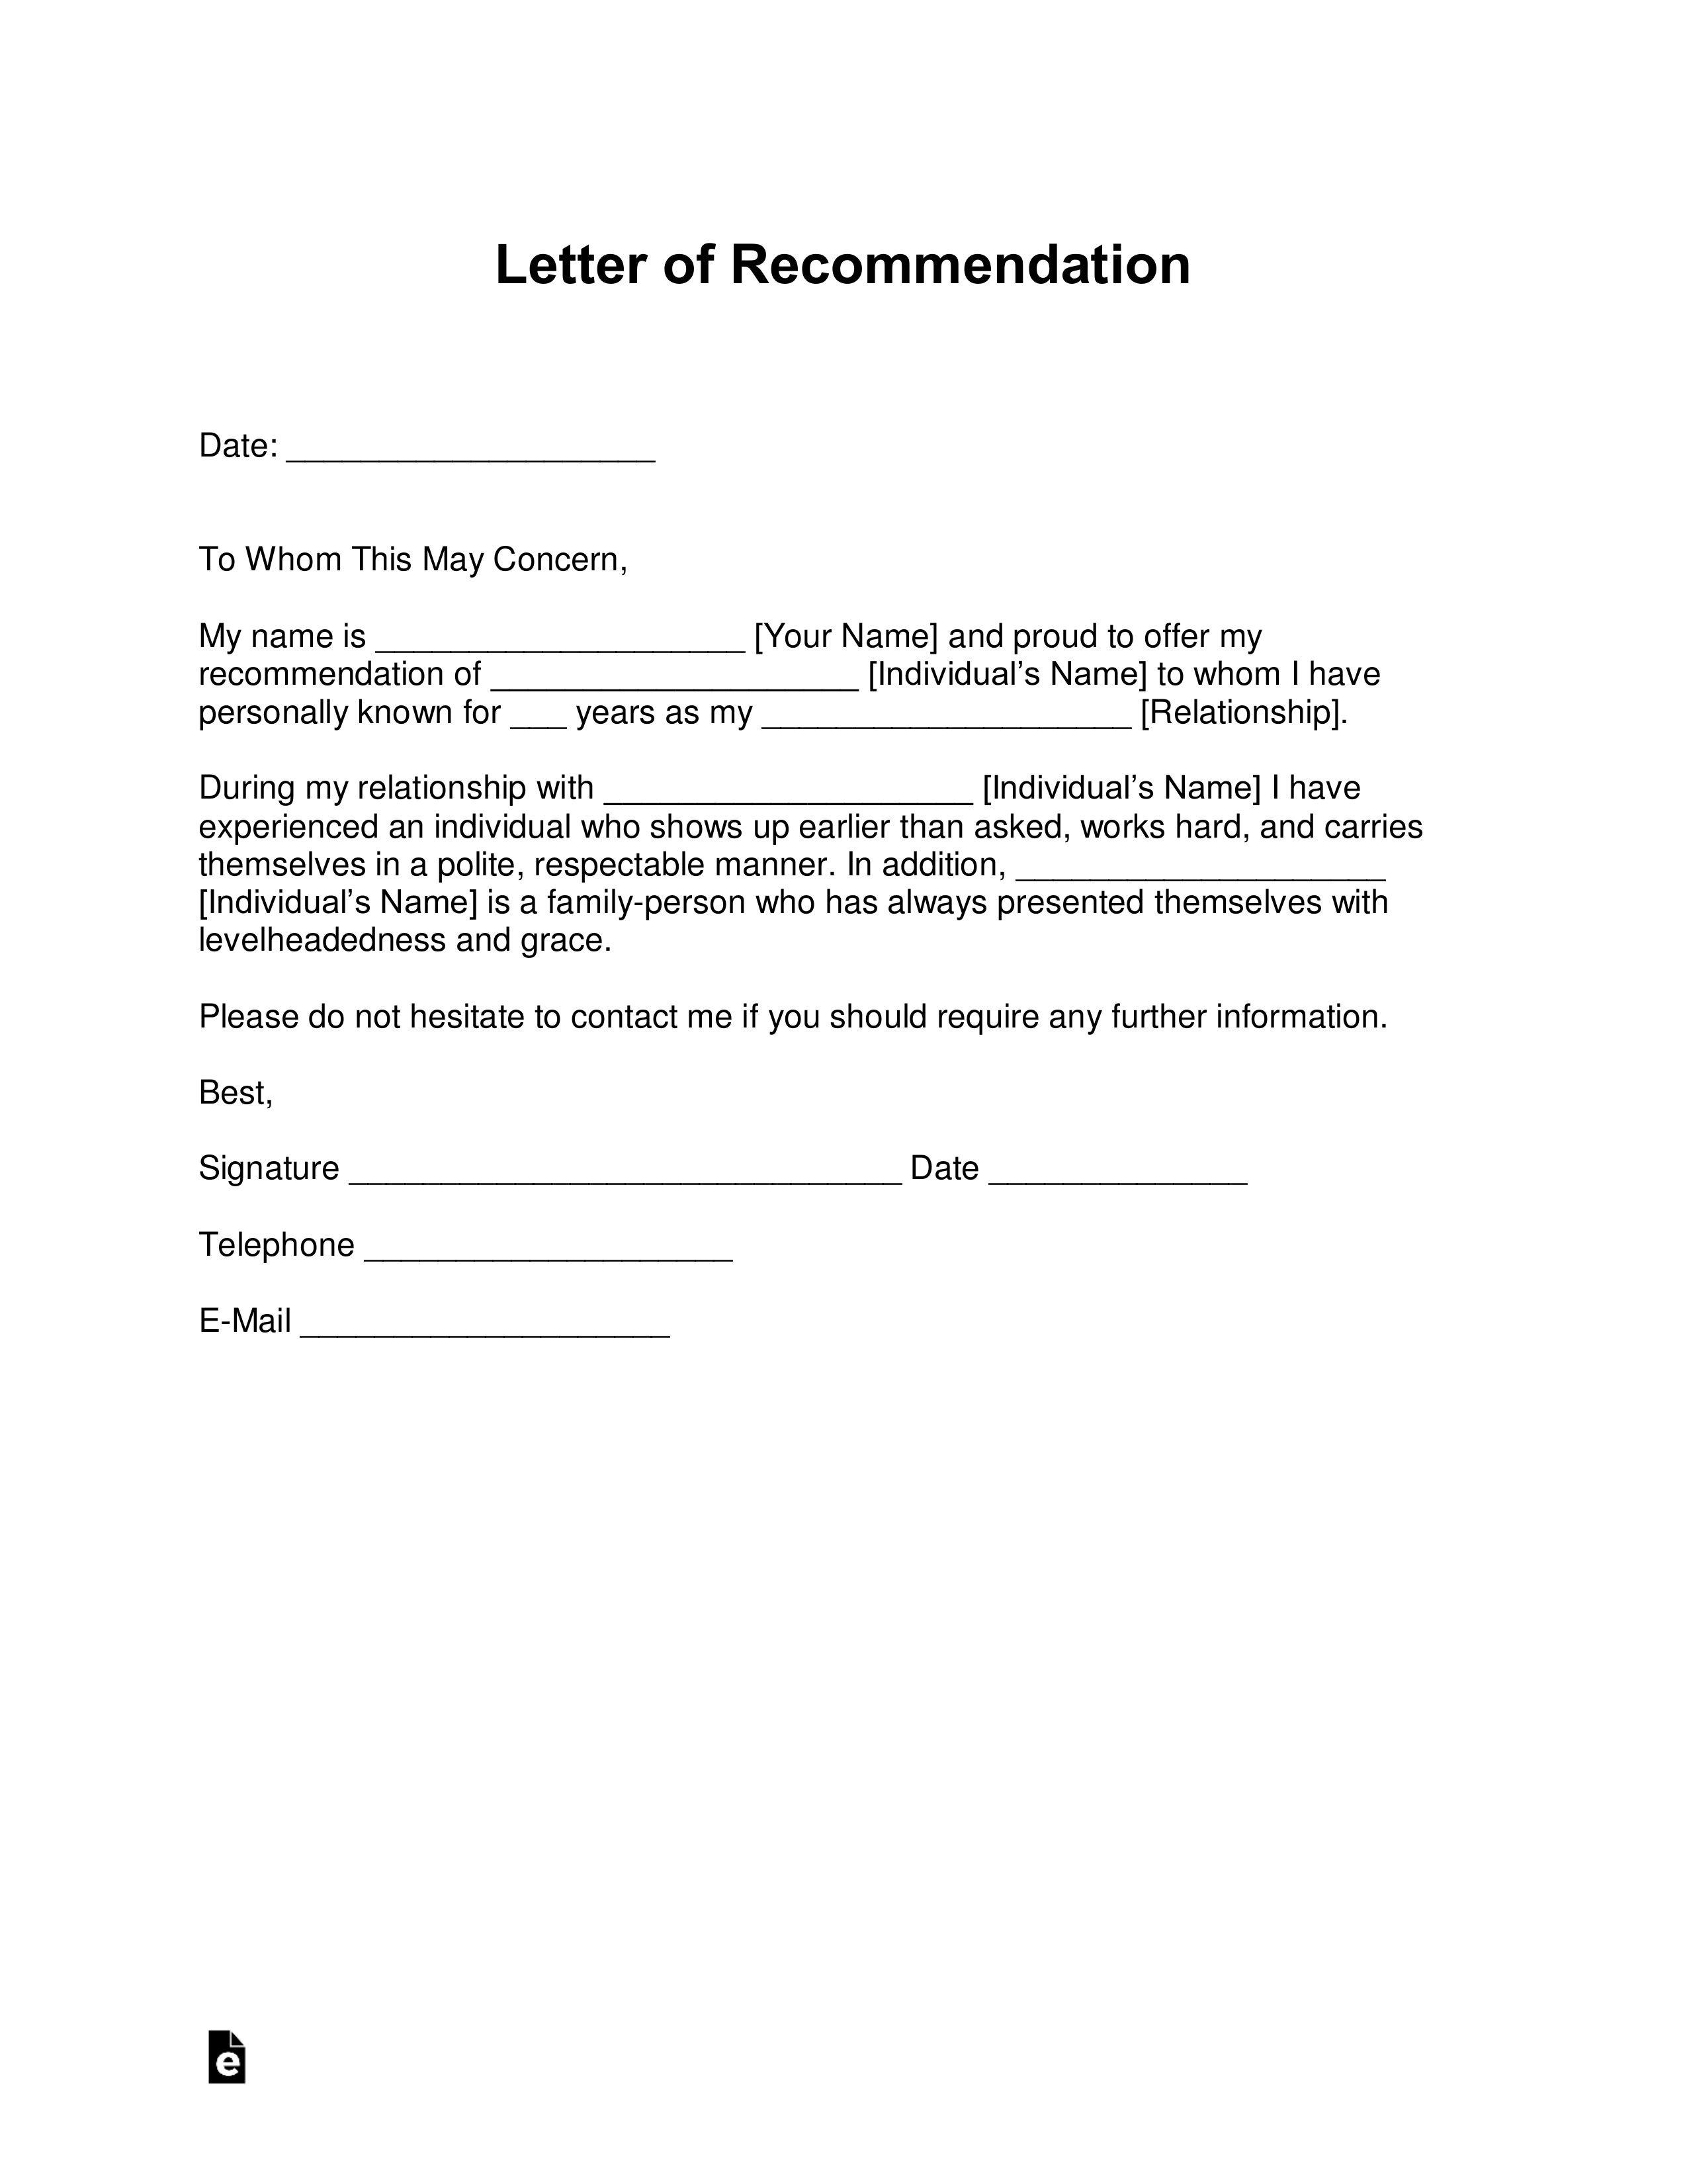 008 Impressive Letter Of Recommendation Template Word Concept  General UkFull